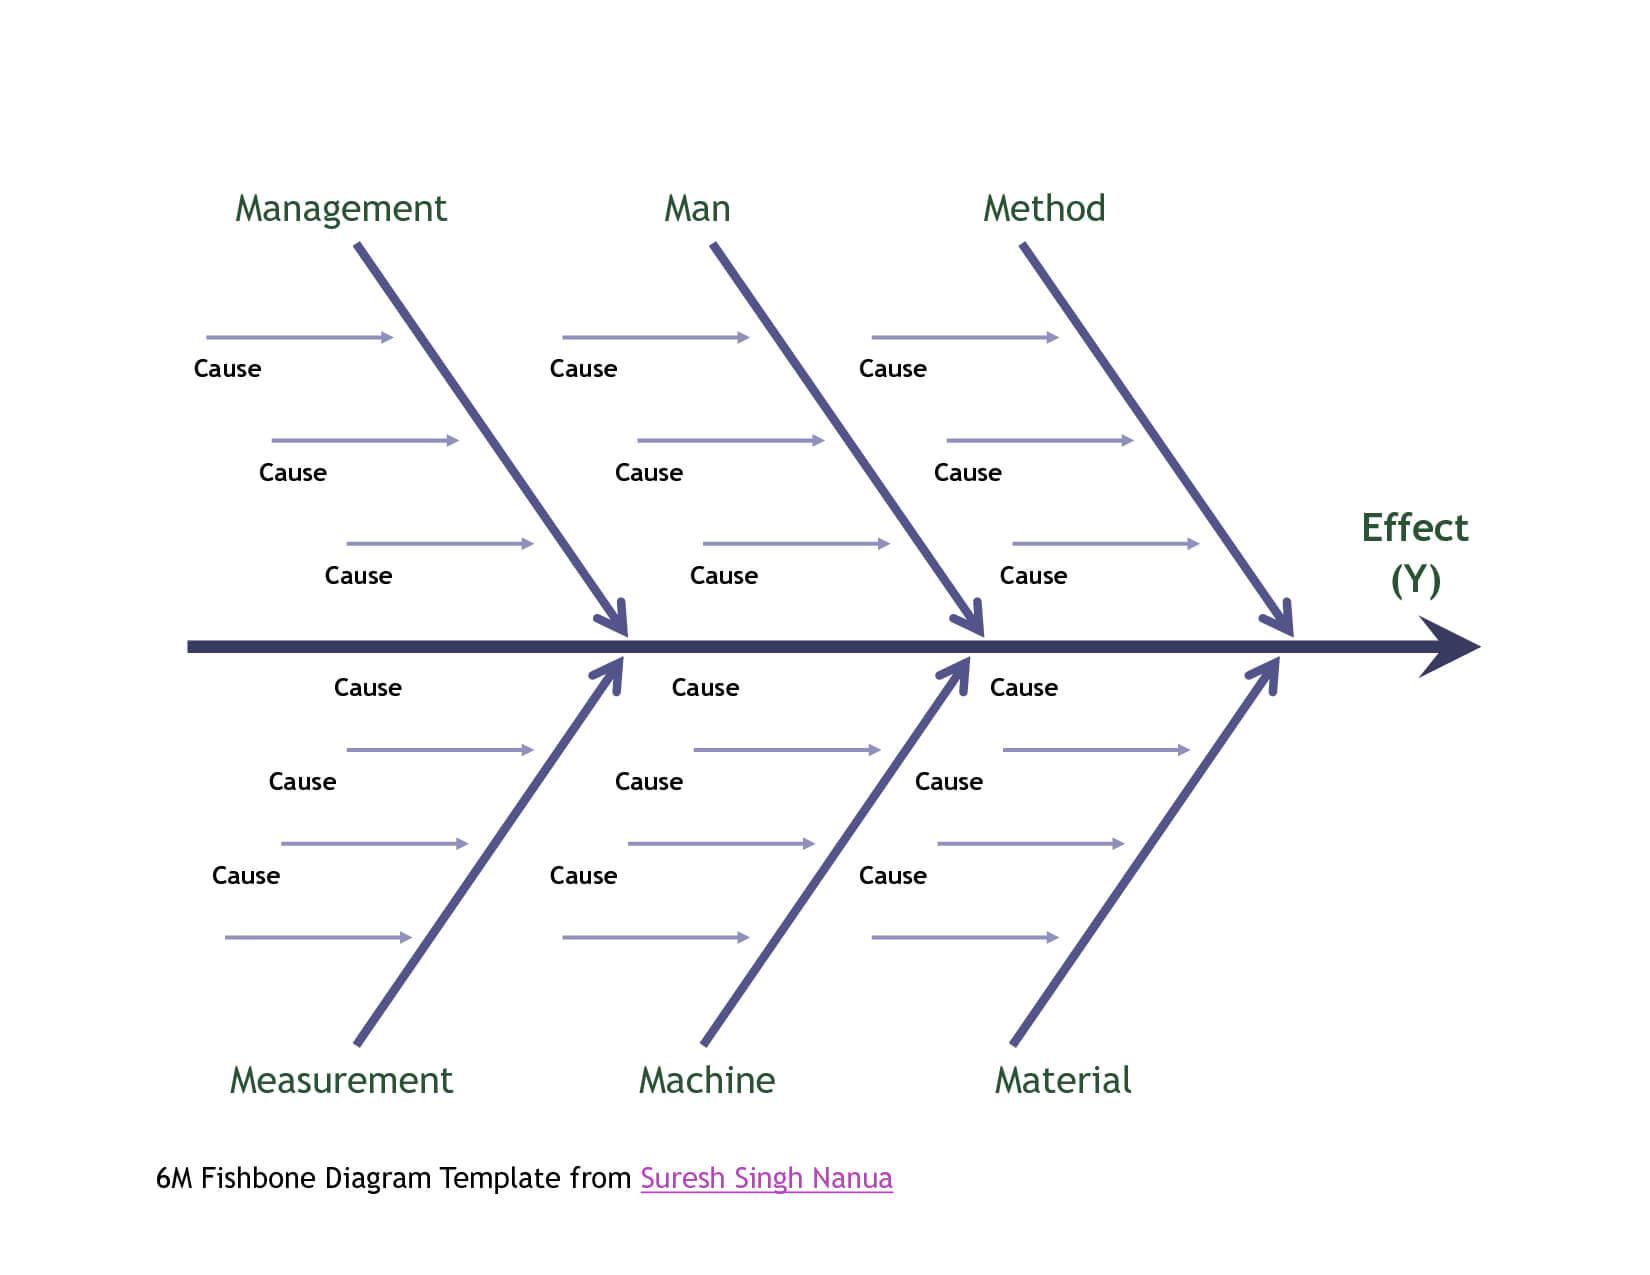 006 Template Ideas Fishbone Diagram Ipbxi231 Exceptional For Blank Fishbone Diagram Template Word